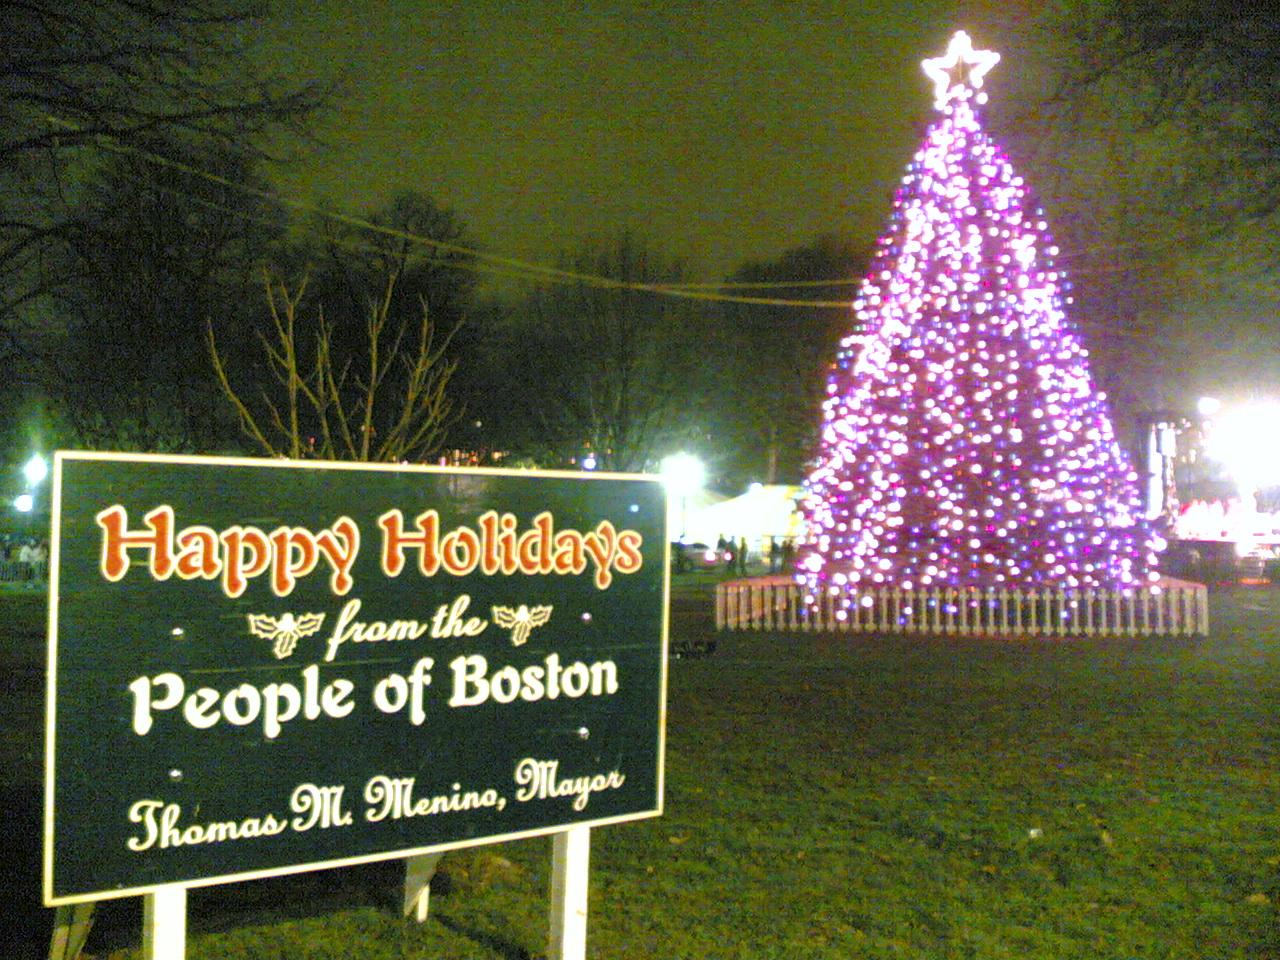 Boston's Tree Lighting Ceremonies Boston Babies - Boston Christmas Tree Lighting